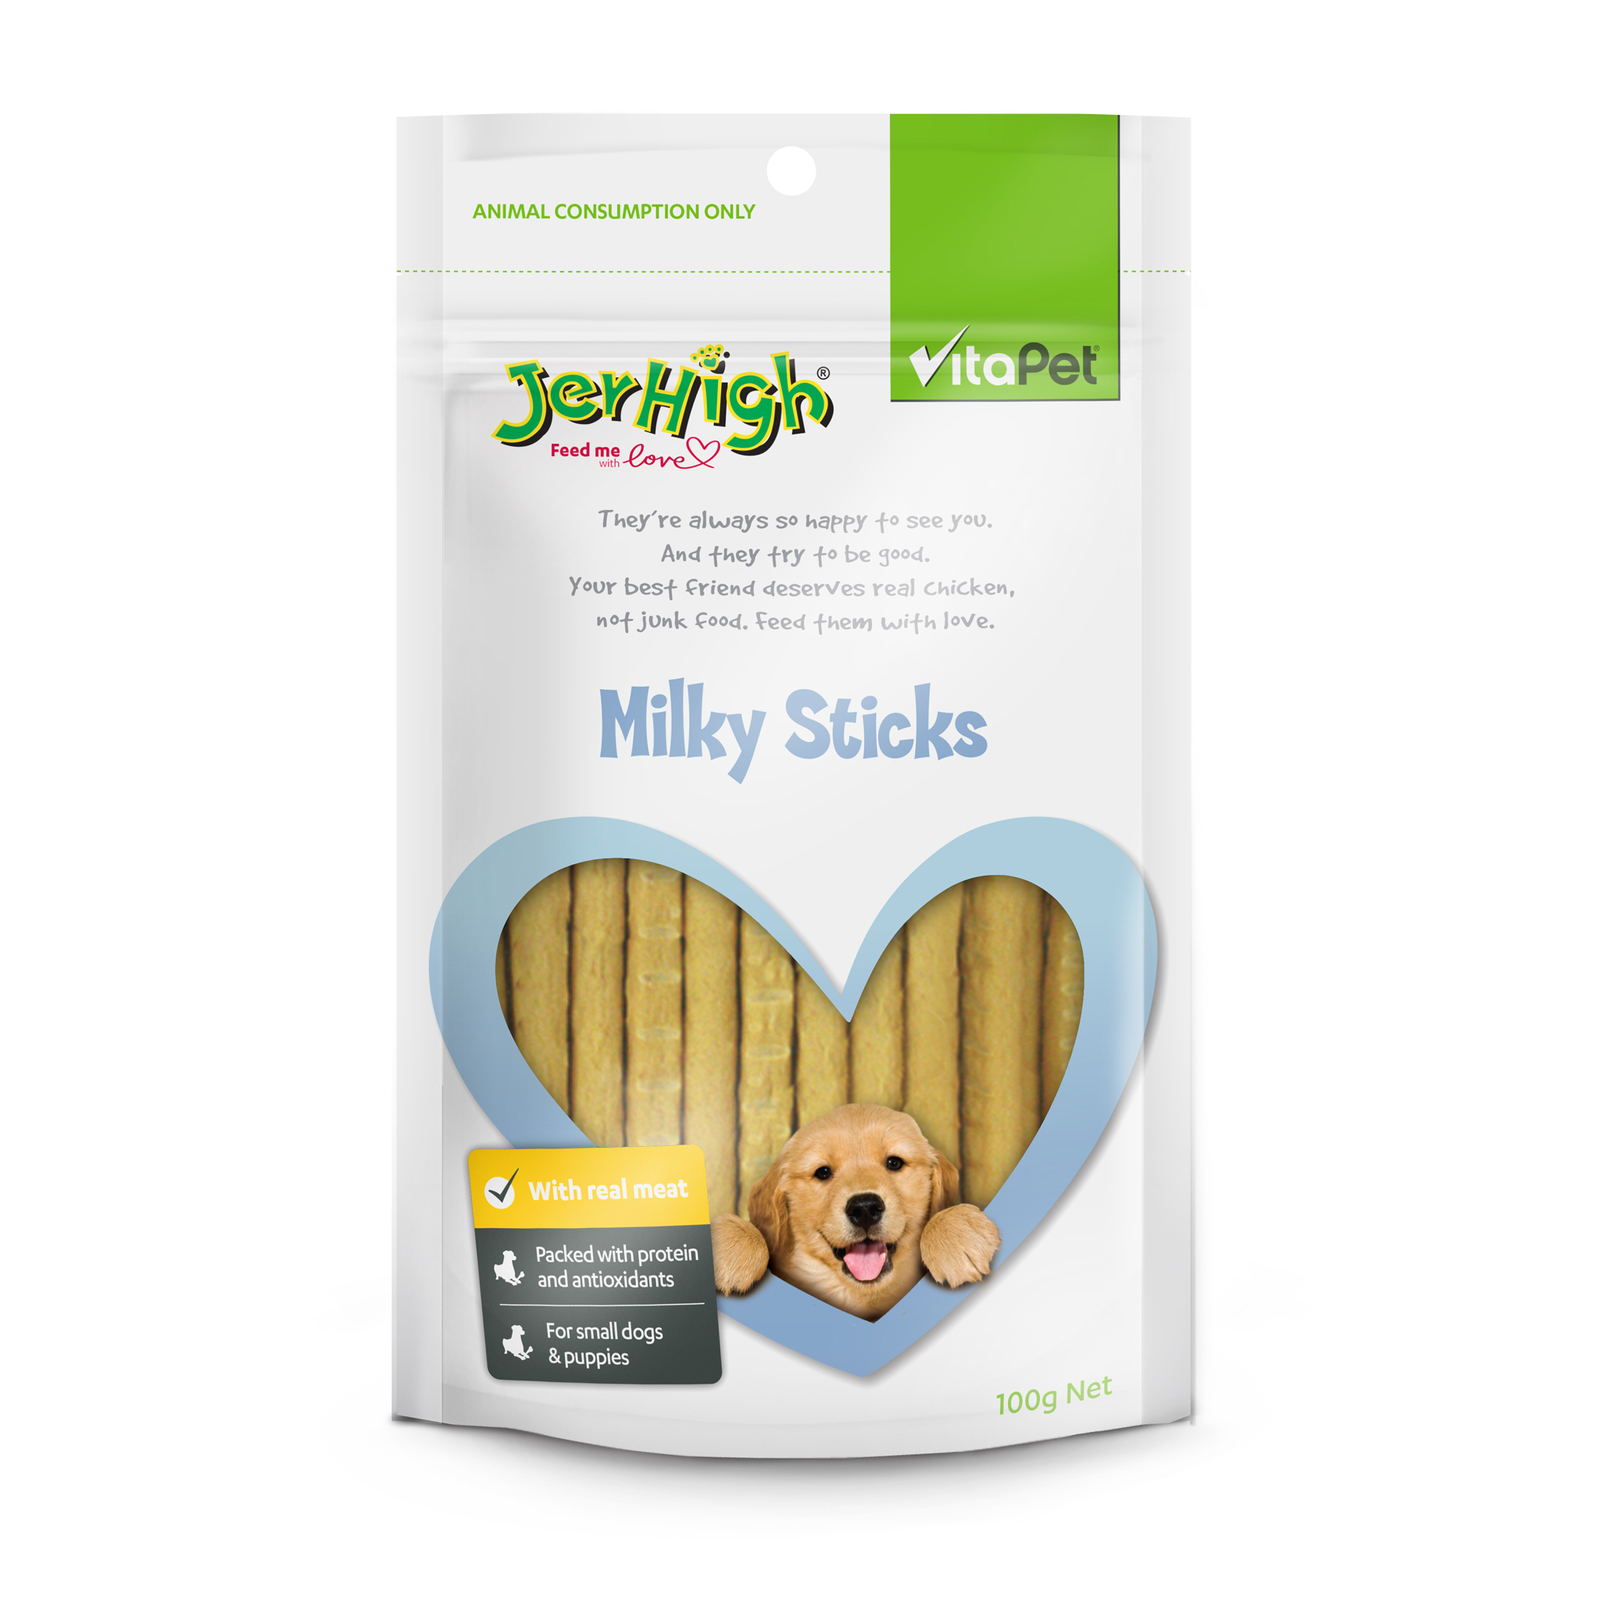 Vitapet: Jerhigh Milky Sticks (100g) image